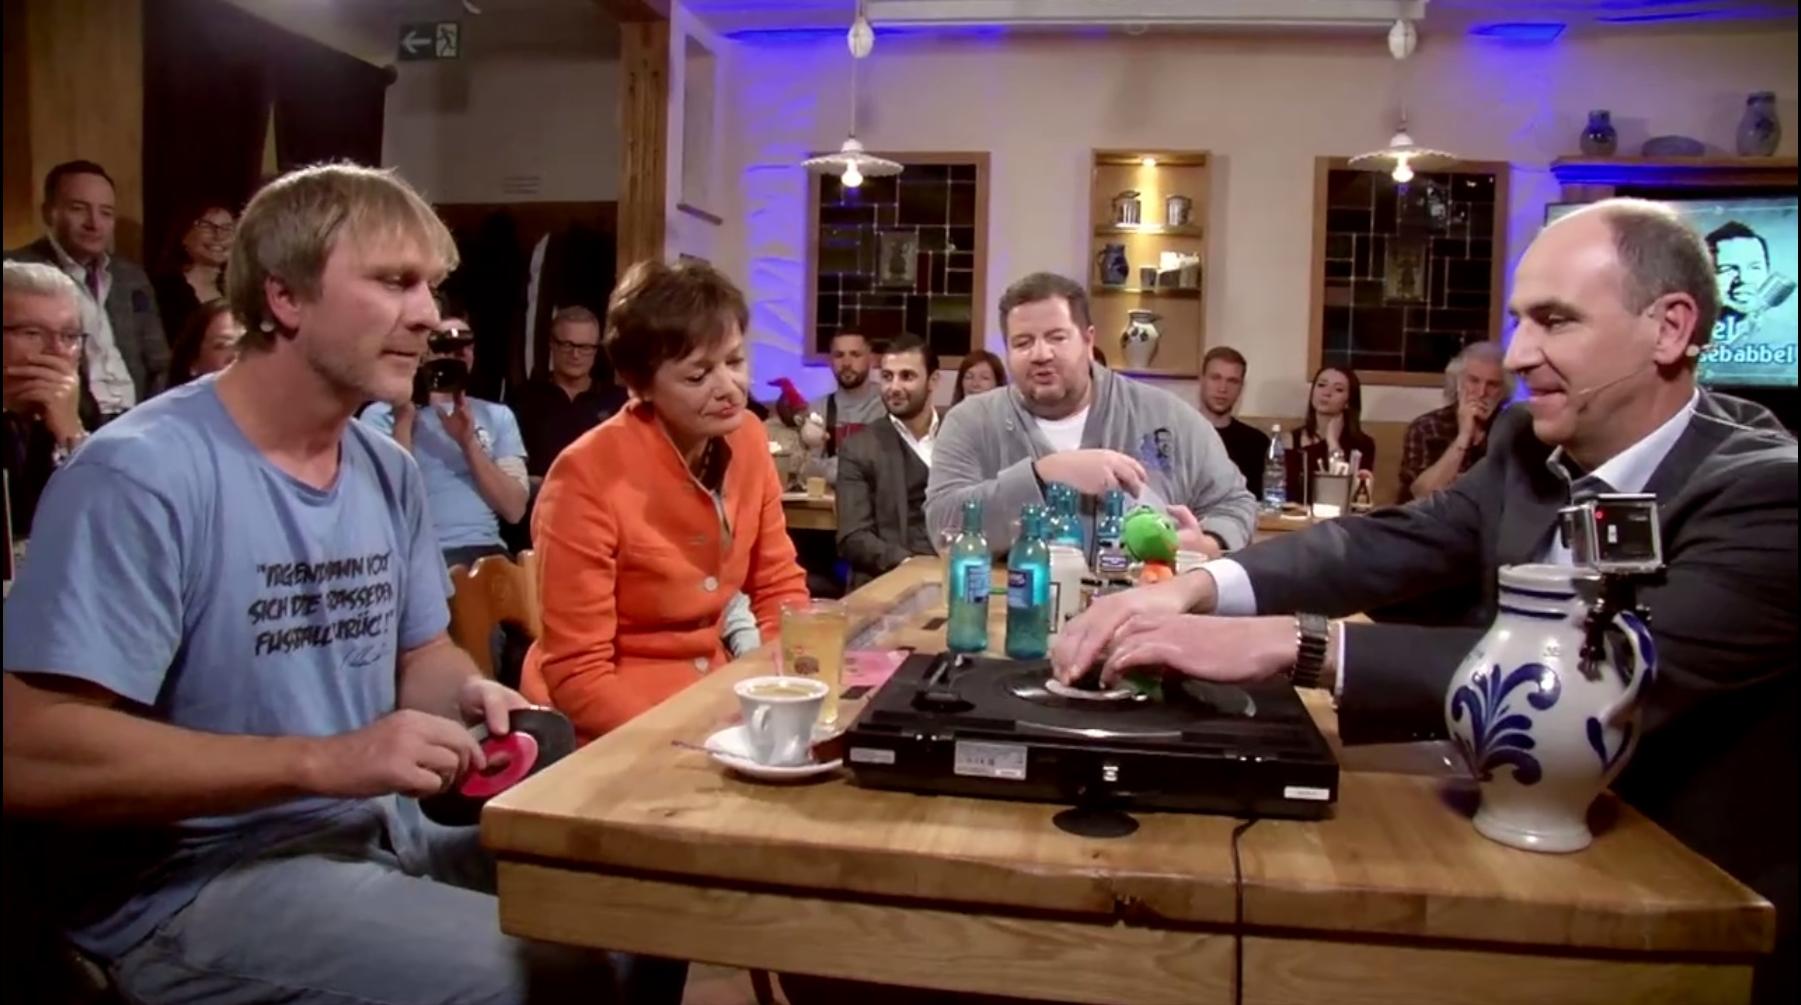 Bembel & Gebabbel – Folge 32 mit Lucia Puttrich, Ansgar Brinkmann & Detlef Lammb